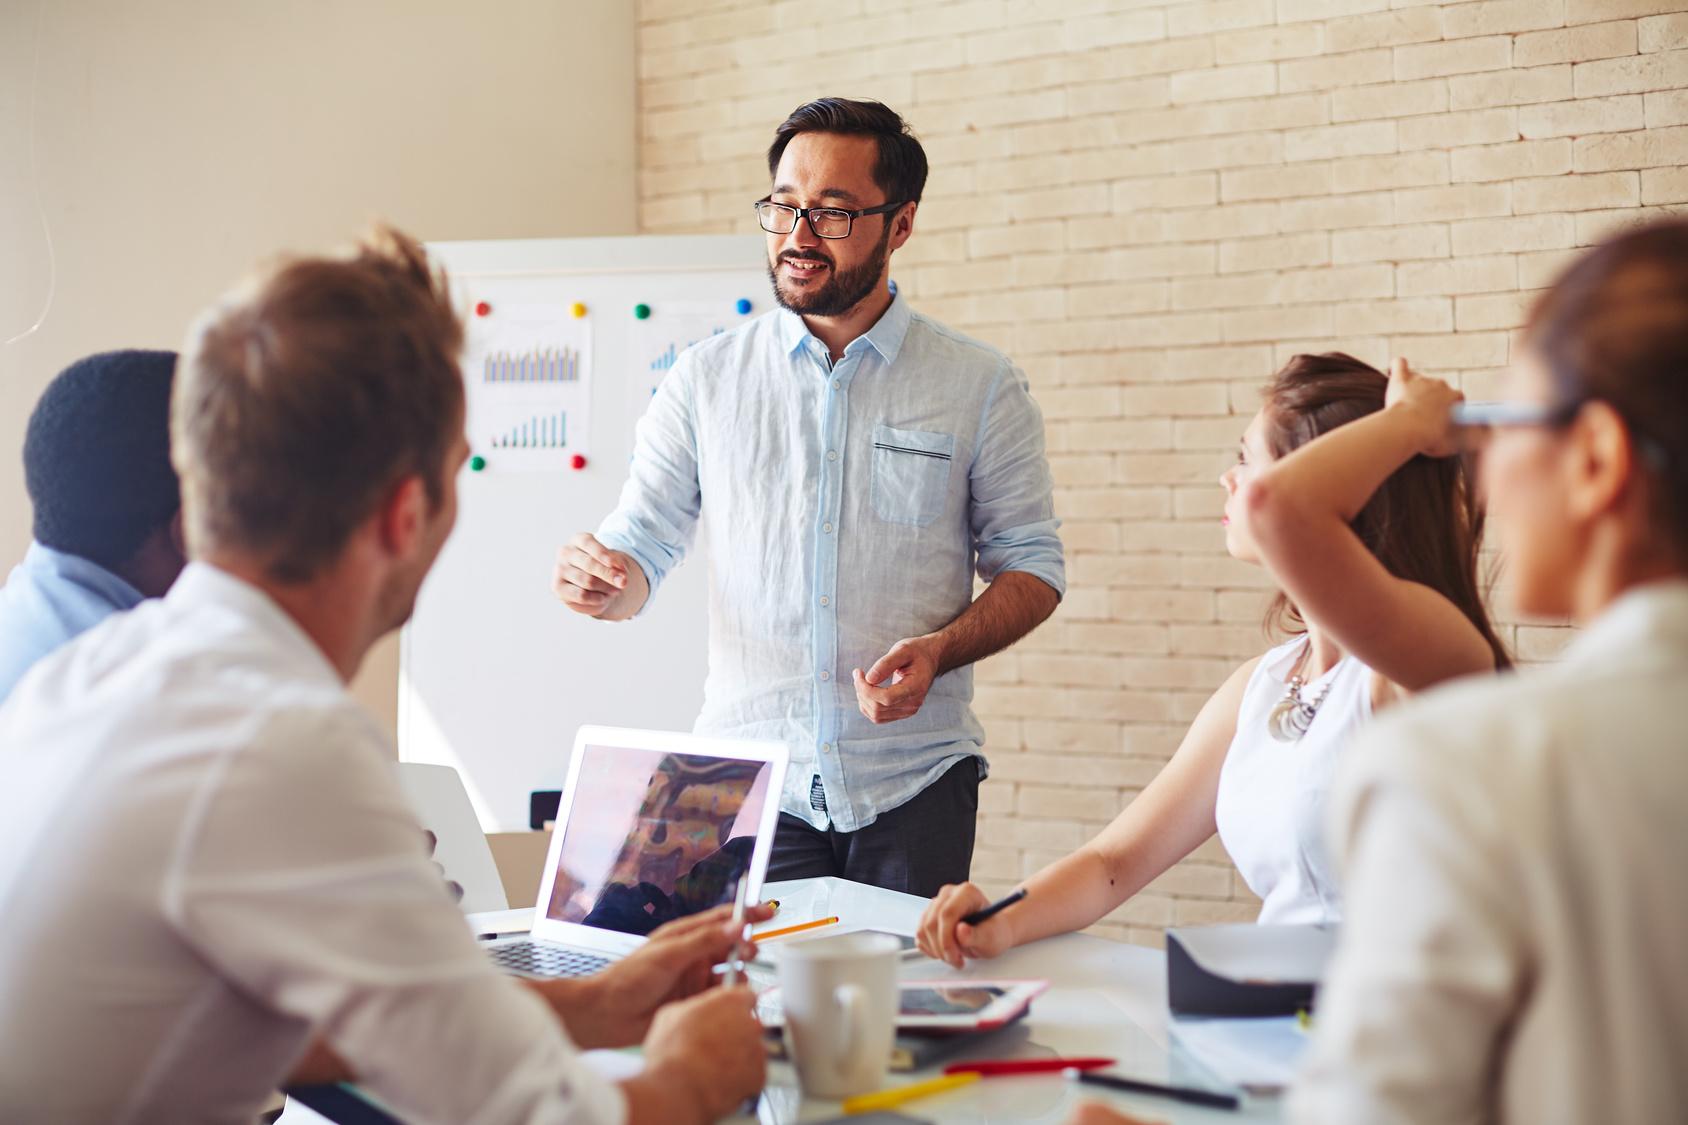 Projekt Przywództwo - Where leaders meet